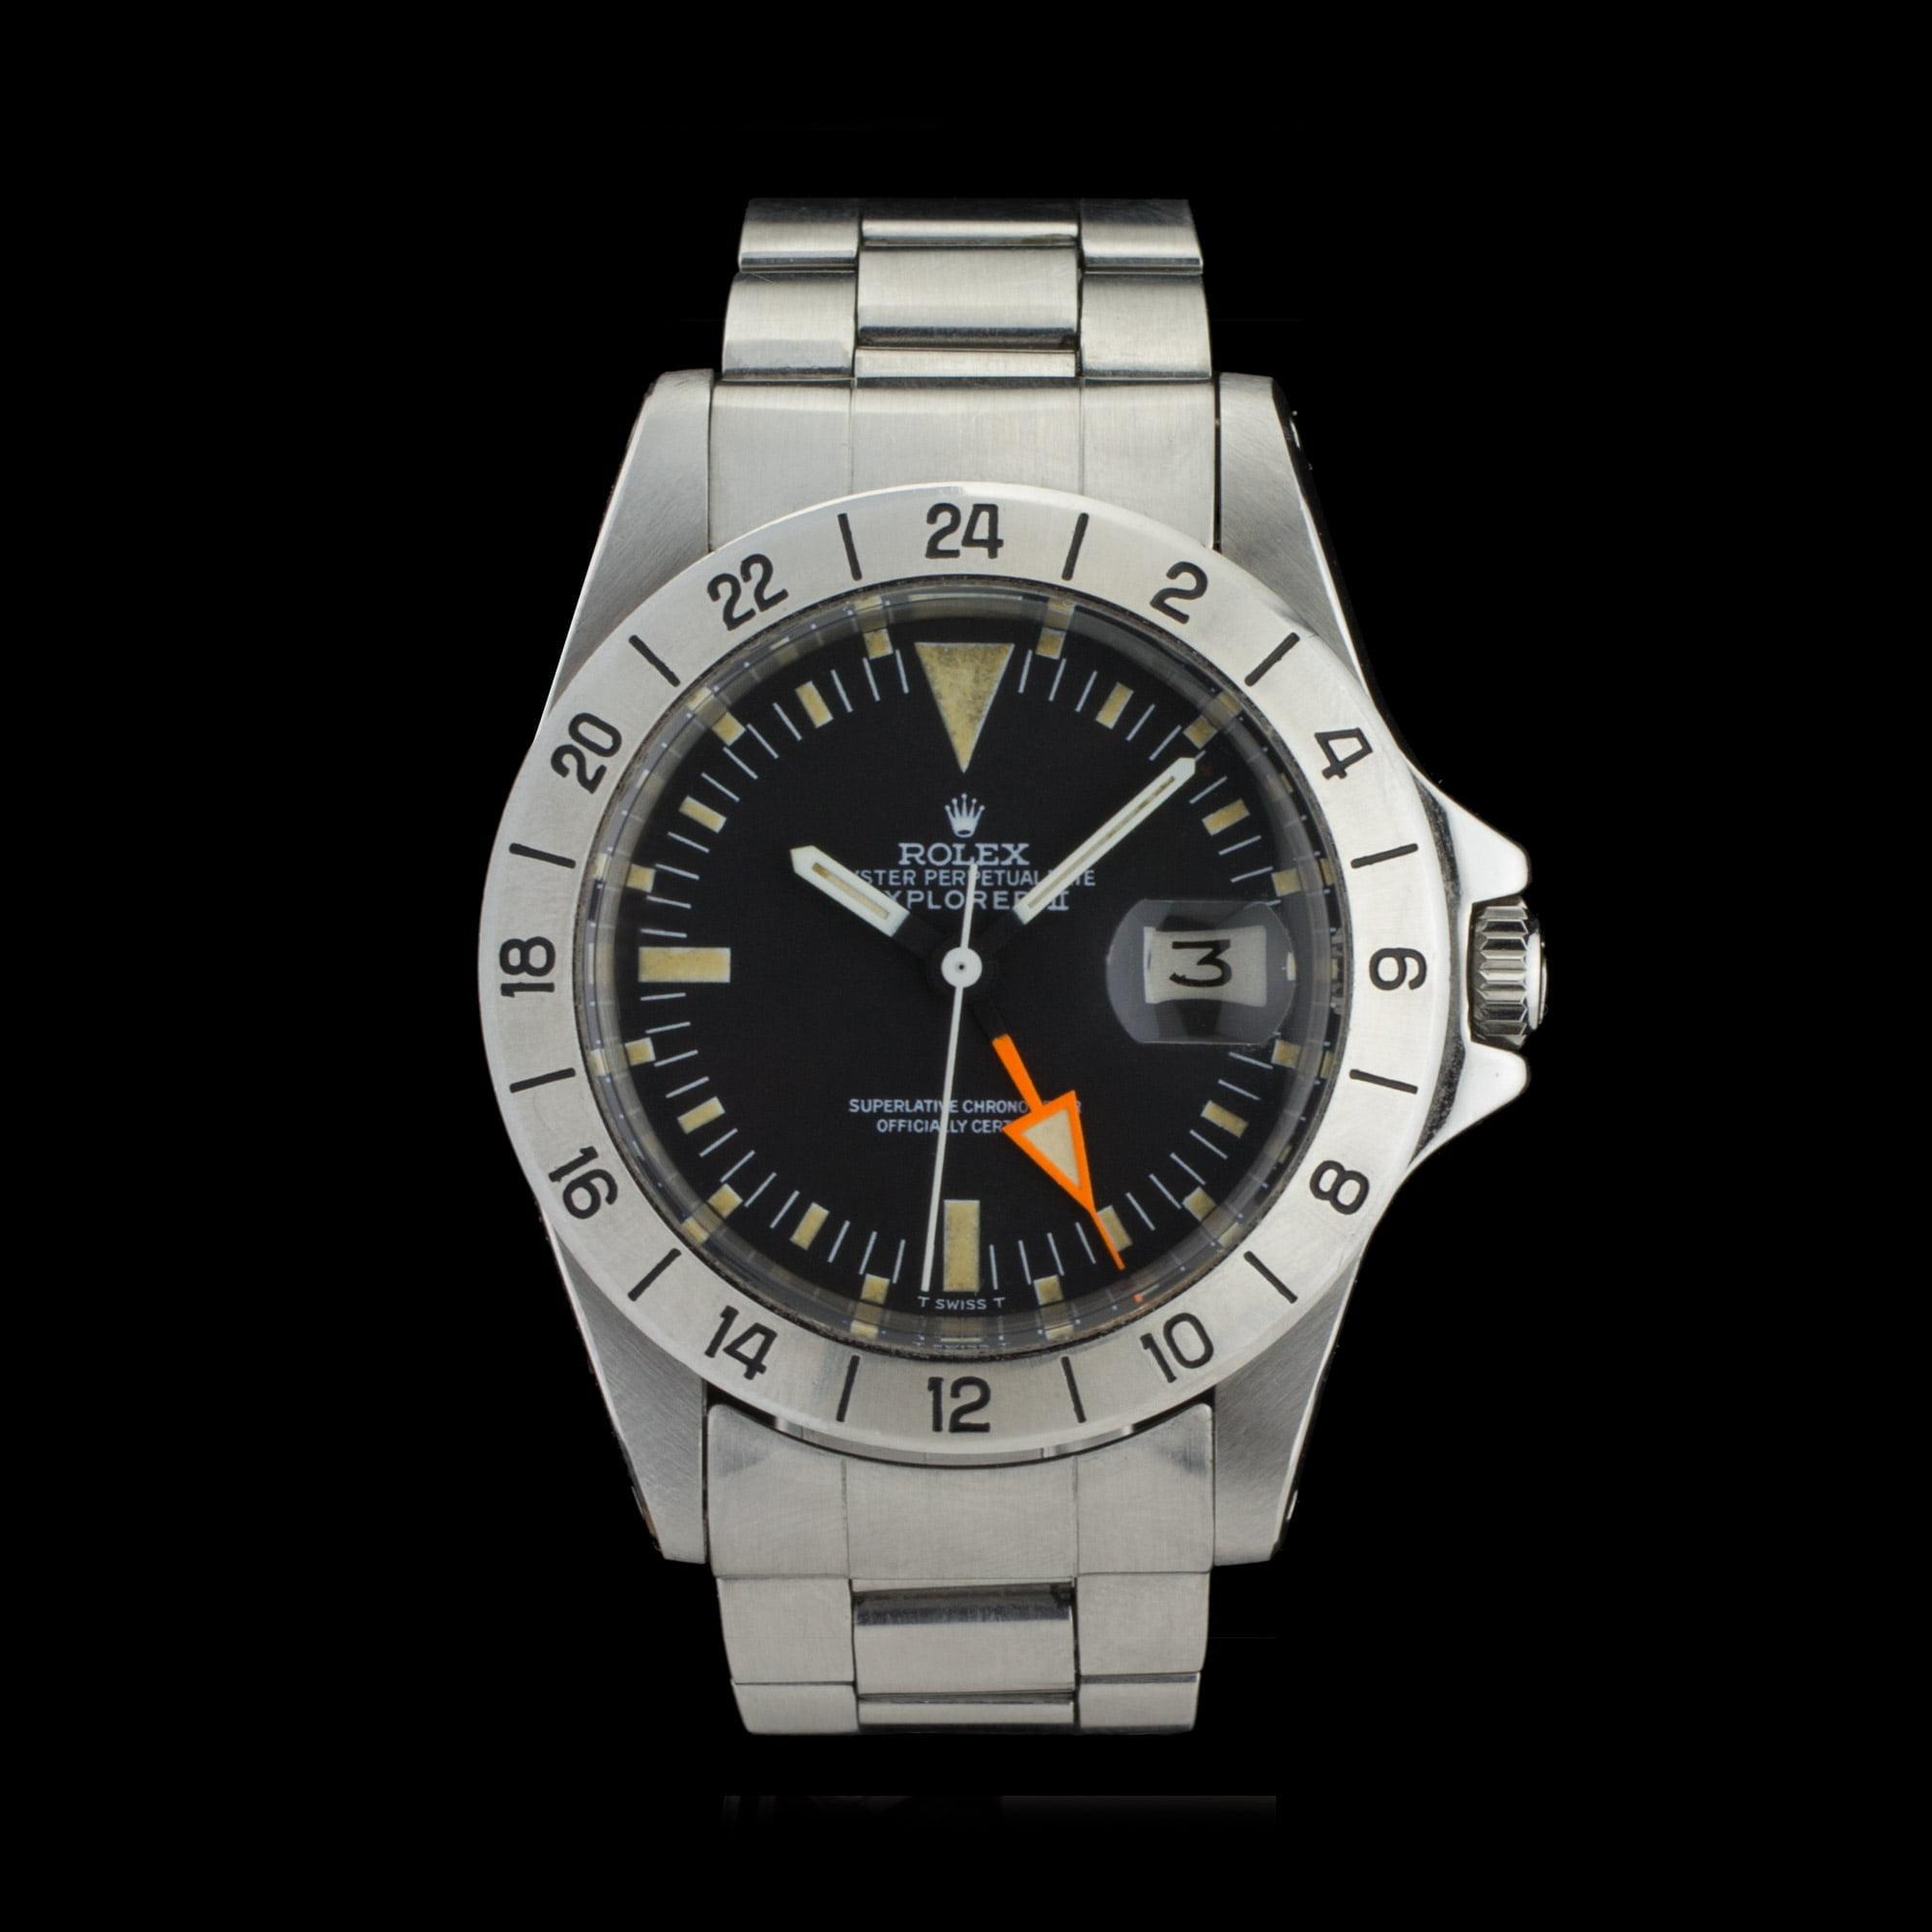 Rolex explorer ii 1655 freccione straight hand amsterdam vintage watches for Rolex explorer